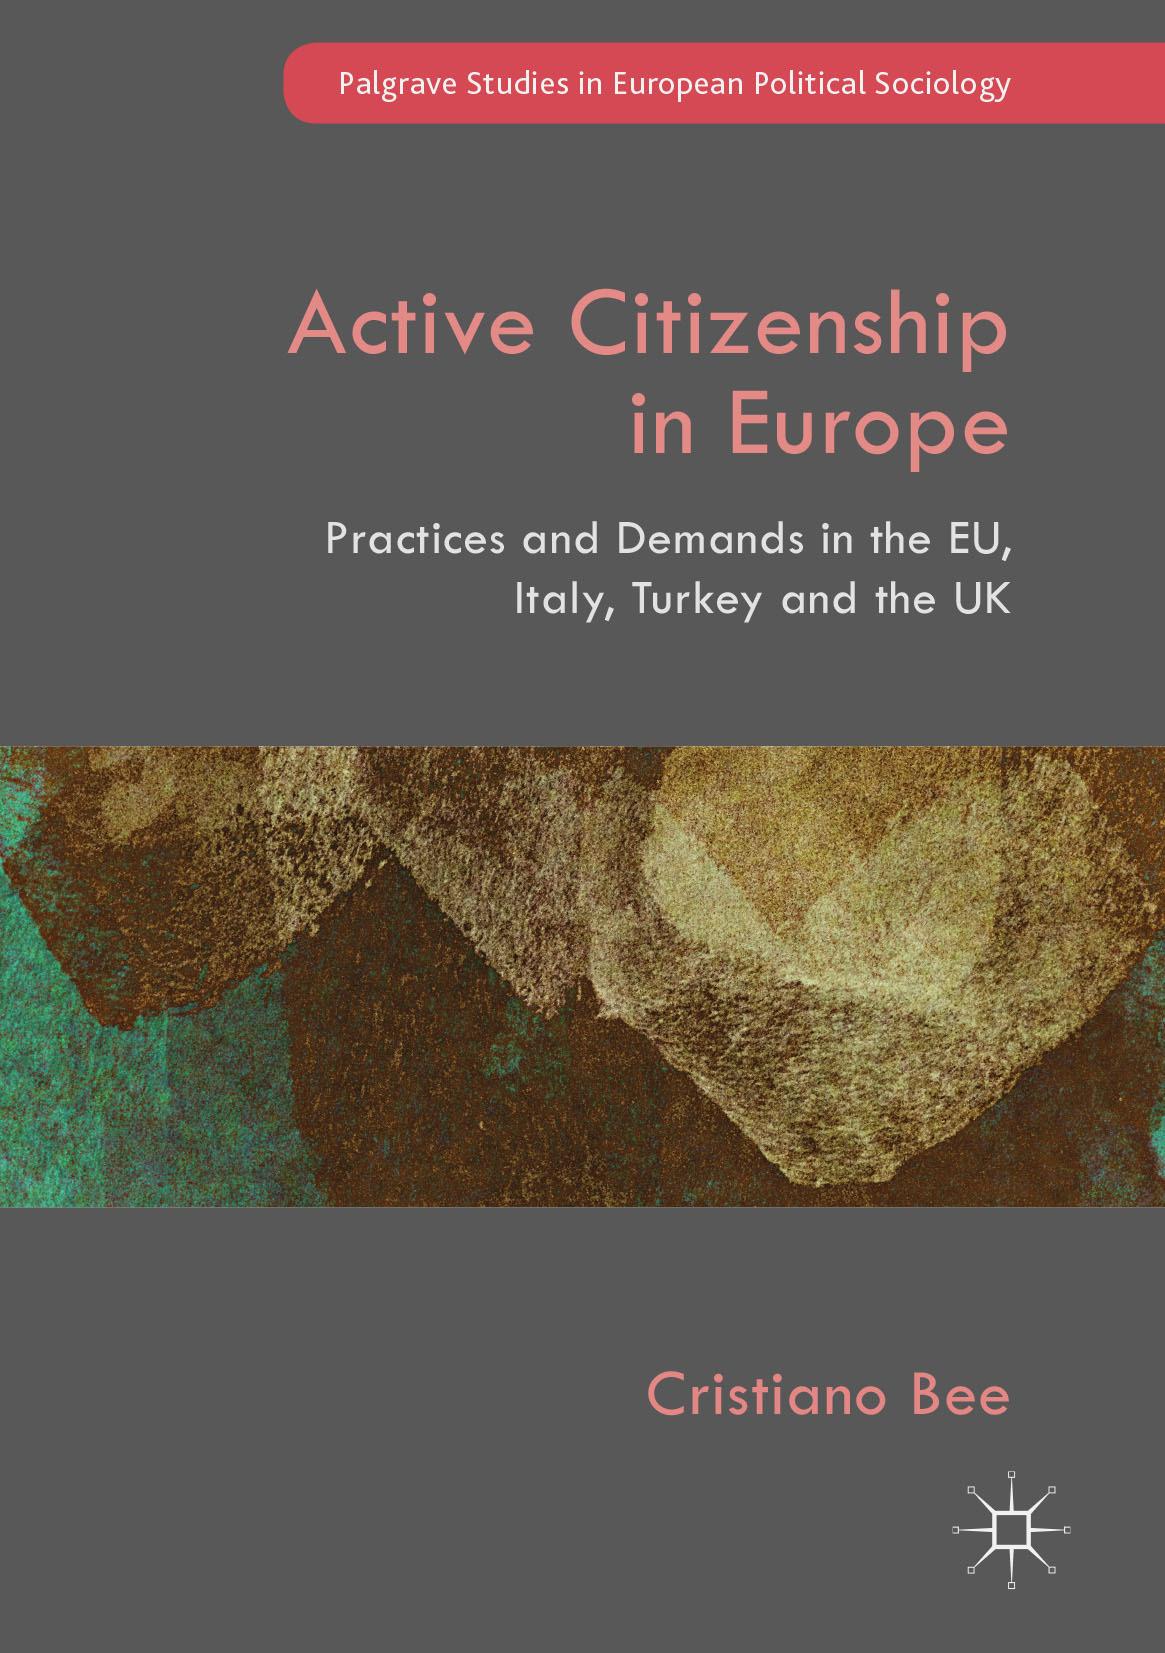 Bee, Cristiano - Active Citizenship in Europe, ebook